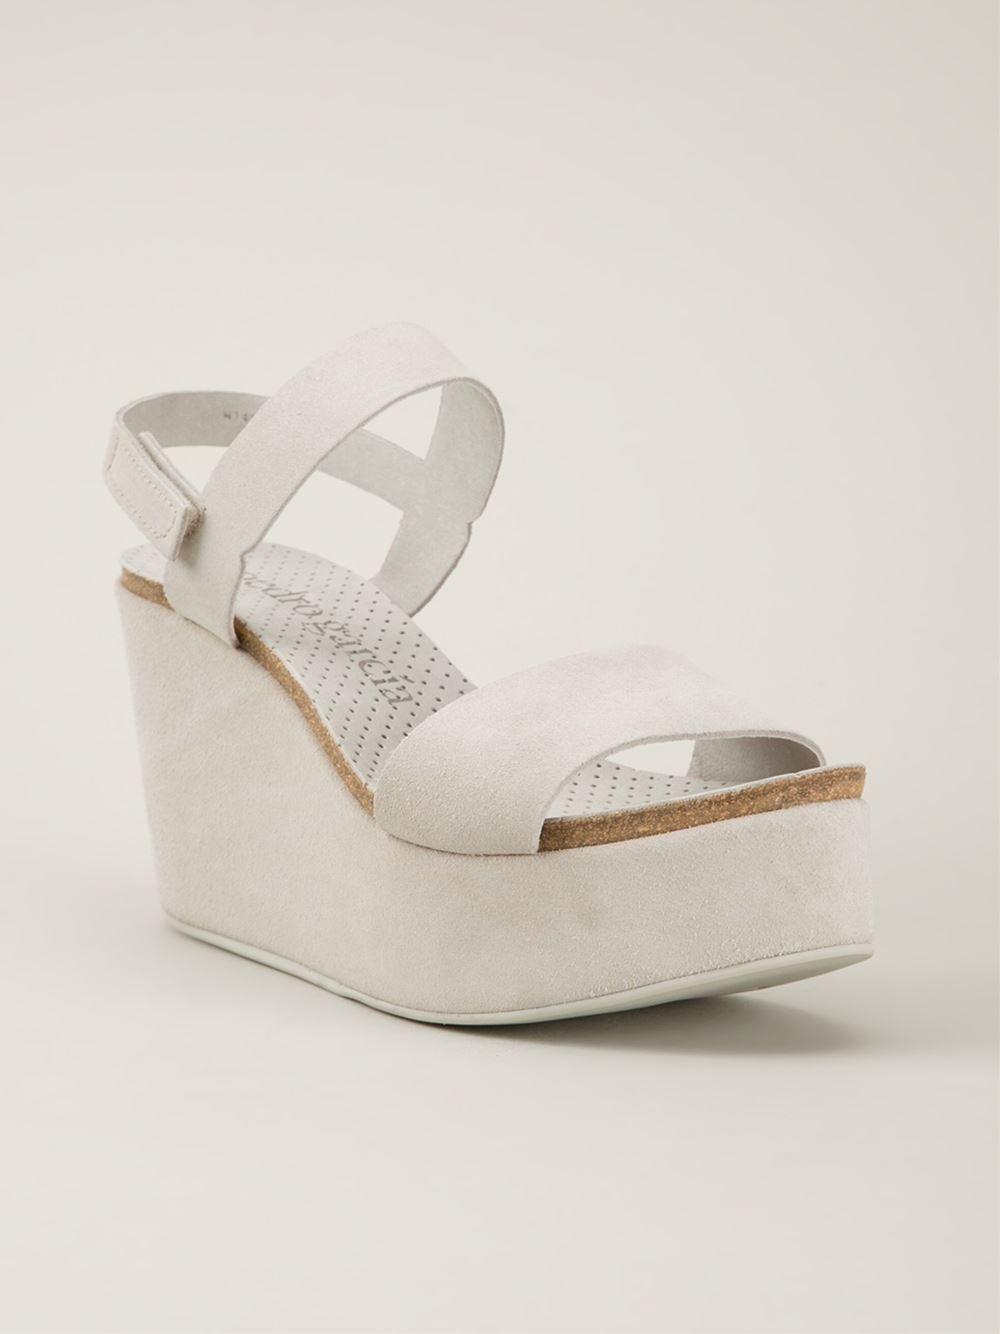 6e1598a03283 Lyst - Pedro Garcia  Dulce  Wedge Sandals in Gray